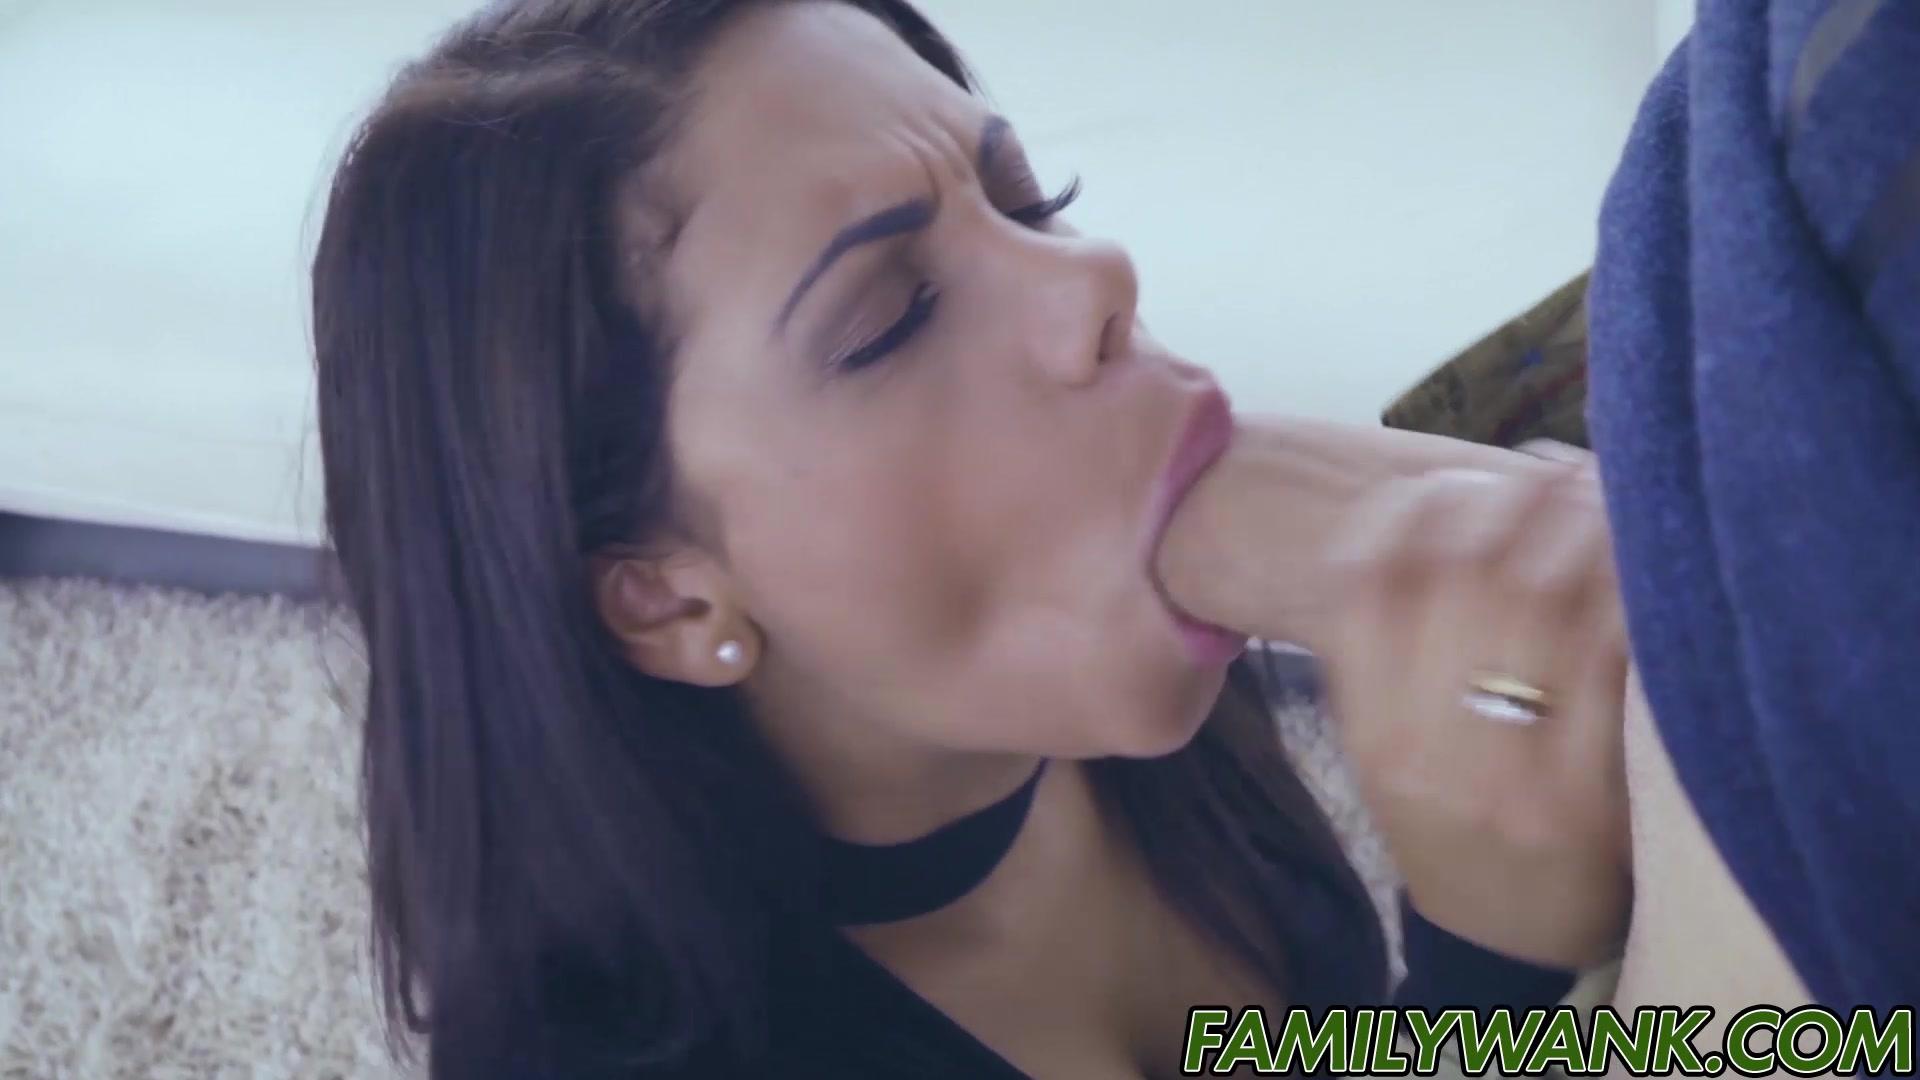 image Two hot stepsisters keyla and sheyla sharing a hard dick